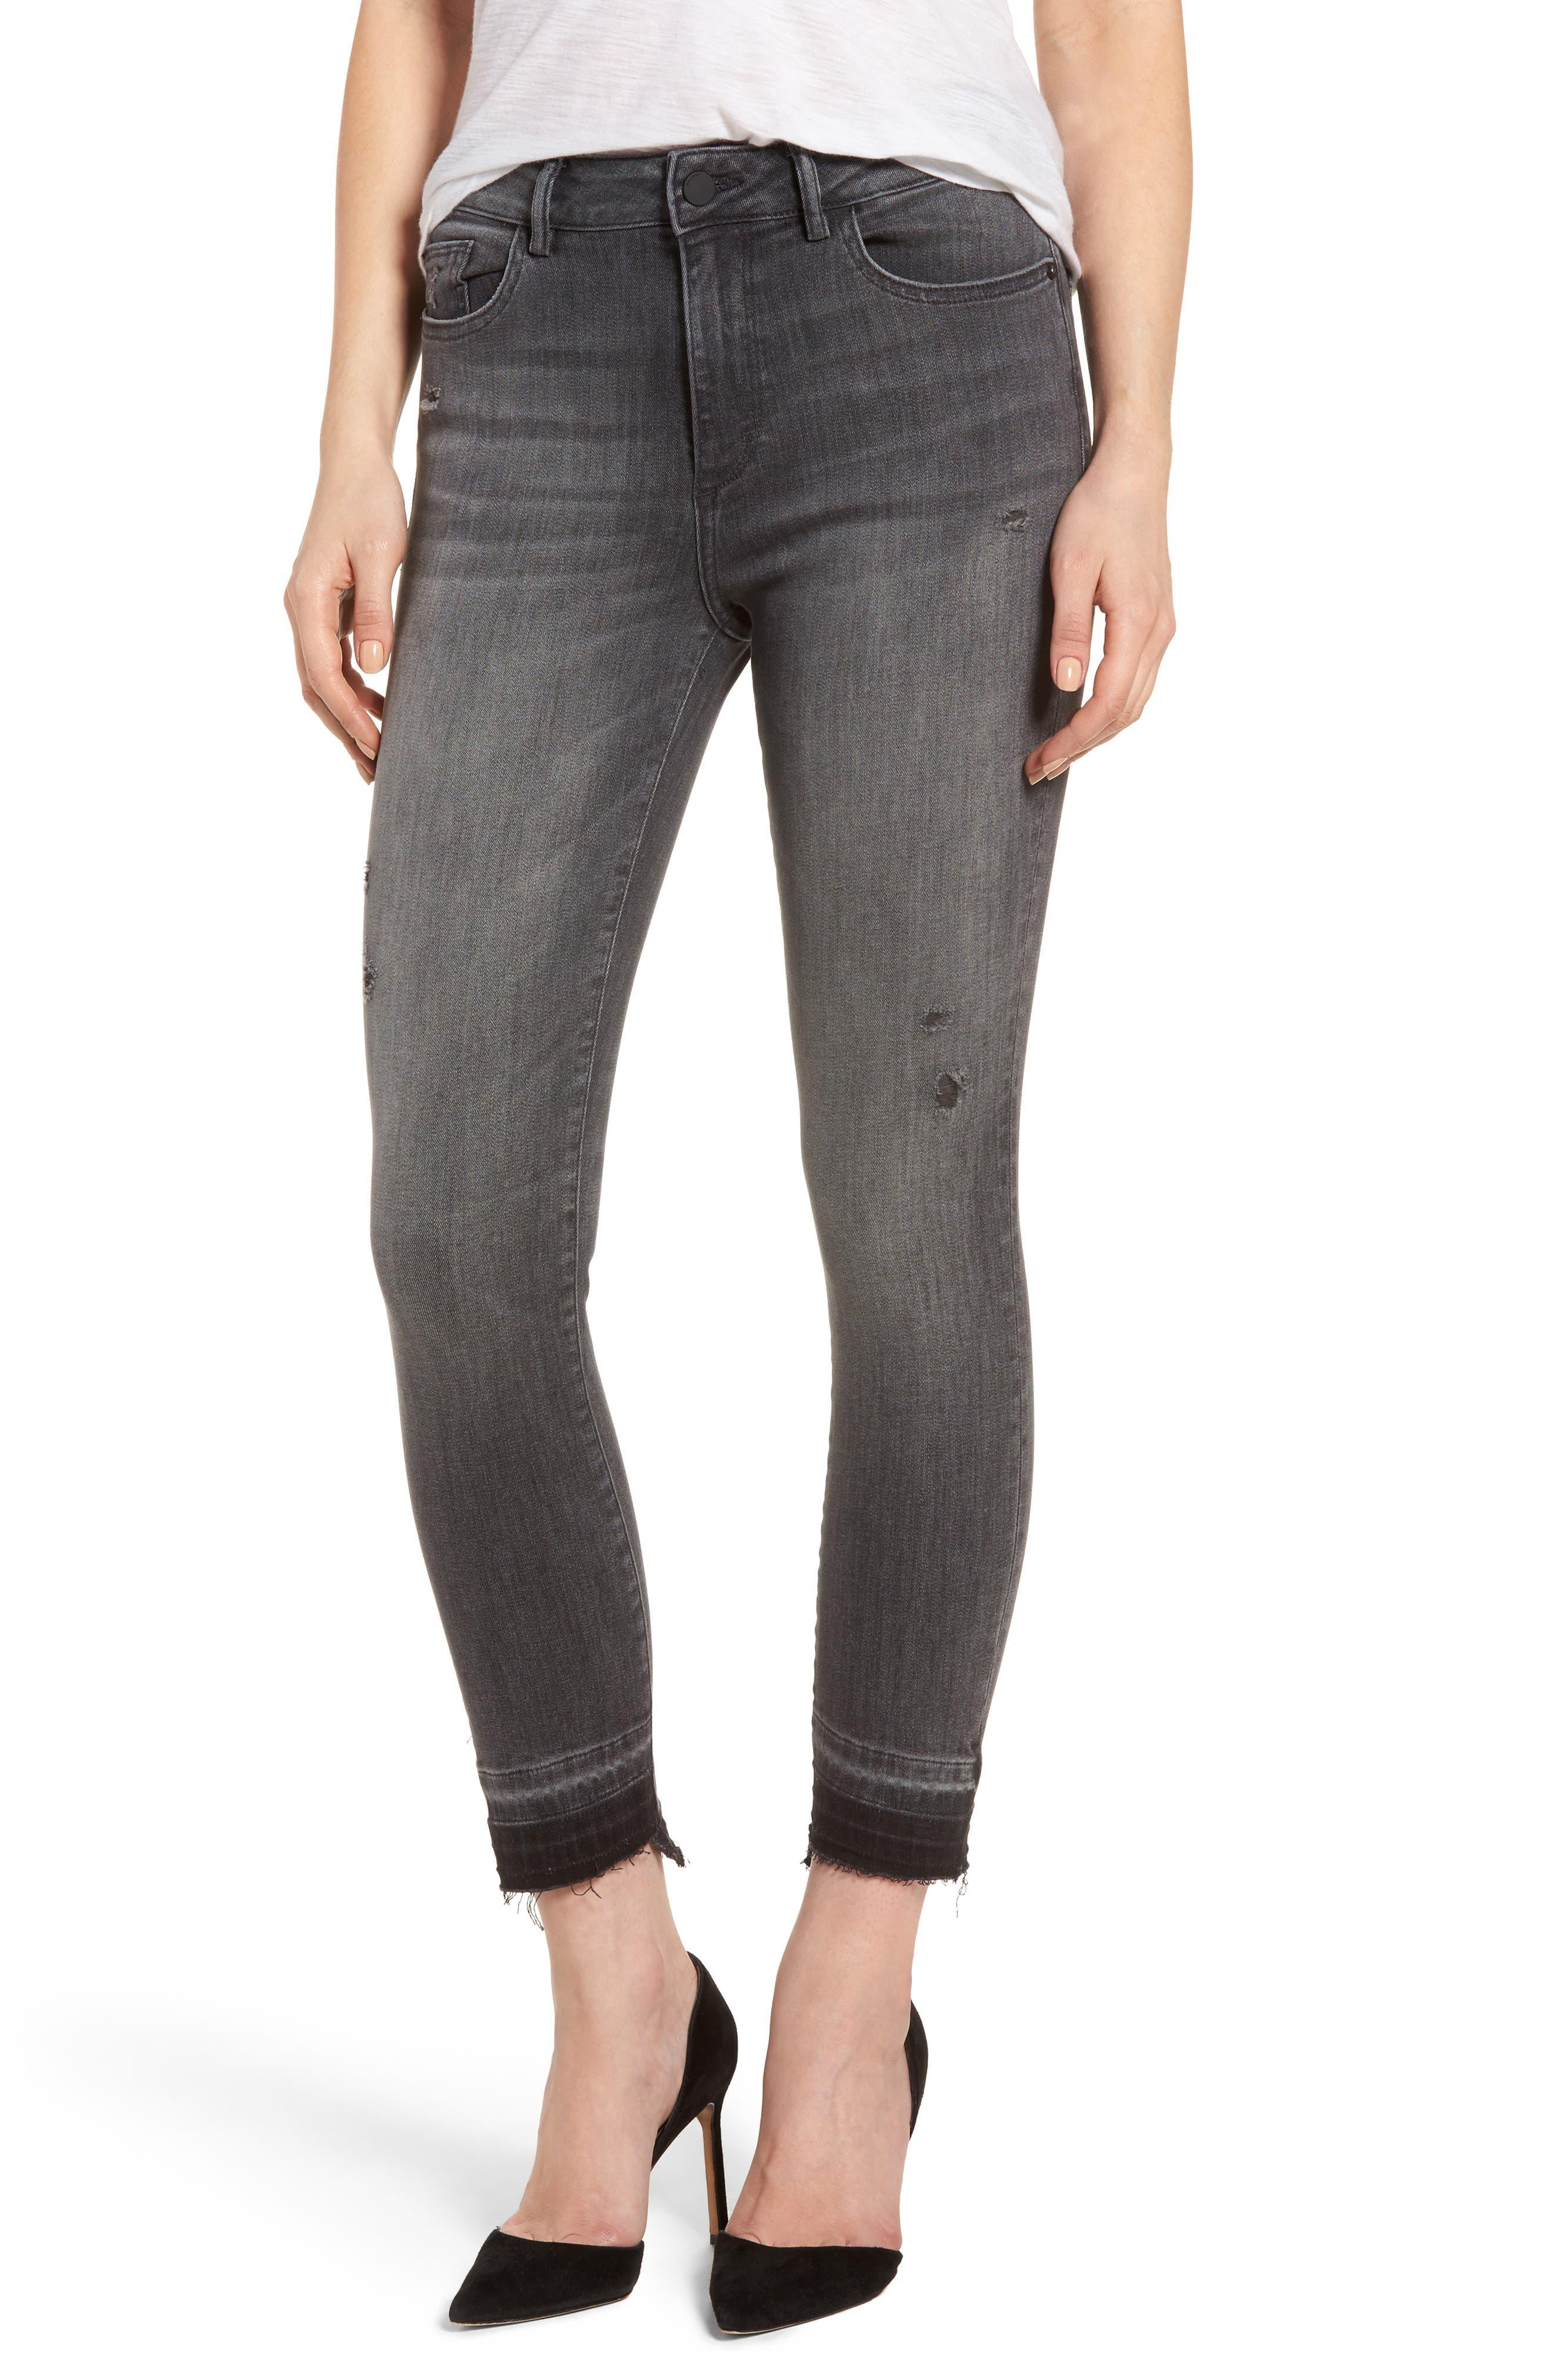 Alternate Image 1 Selected - DL1961 Farrow High Waist Instaslim Skinny Jeans (Whitney)